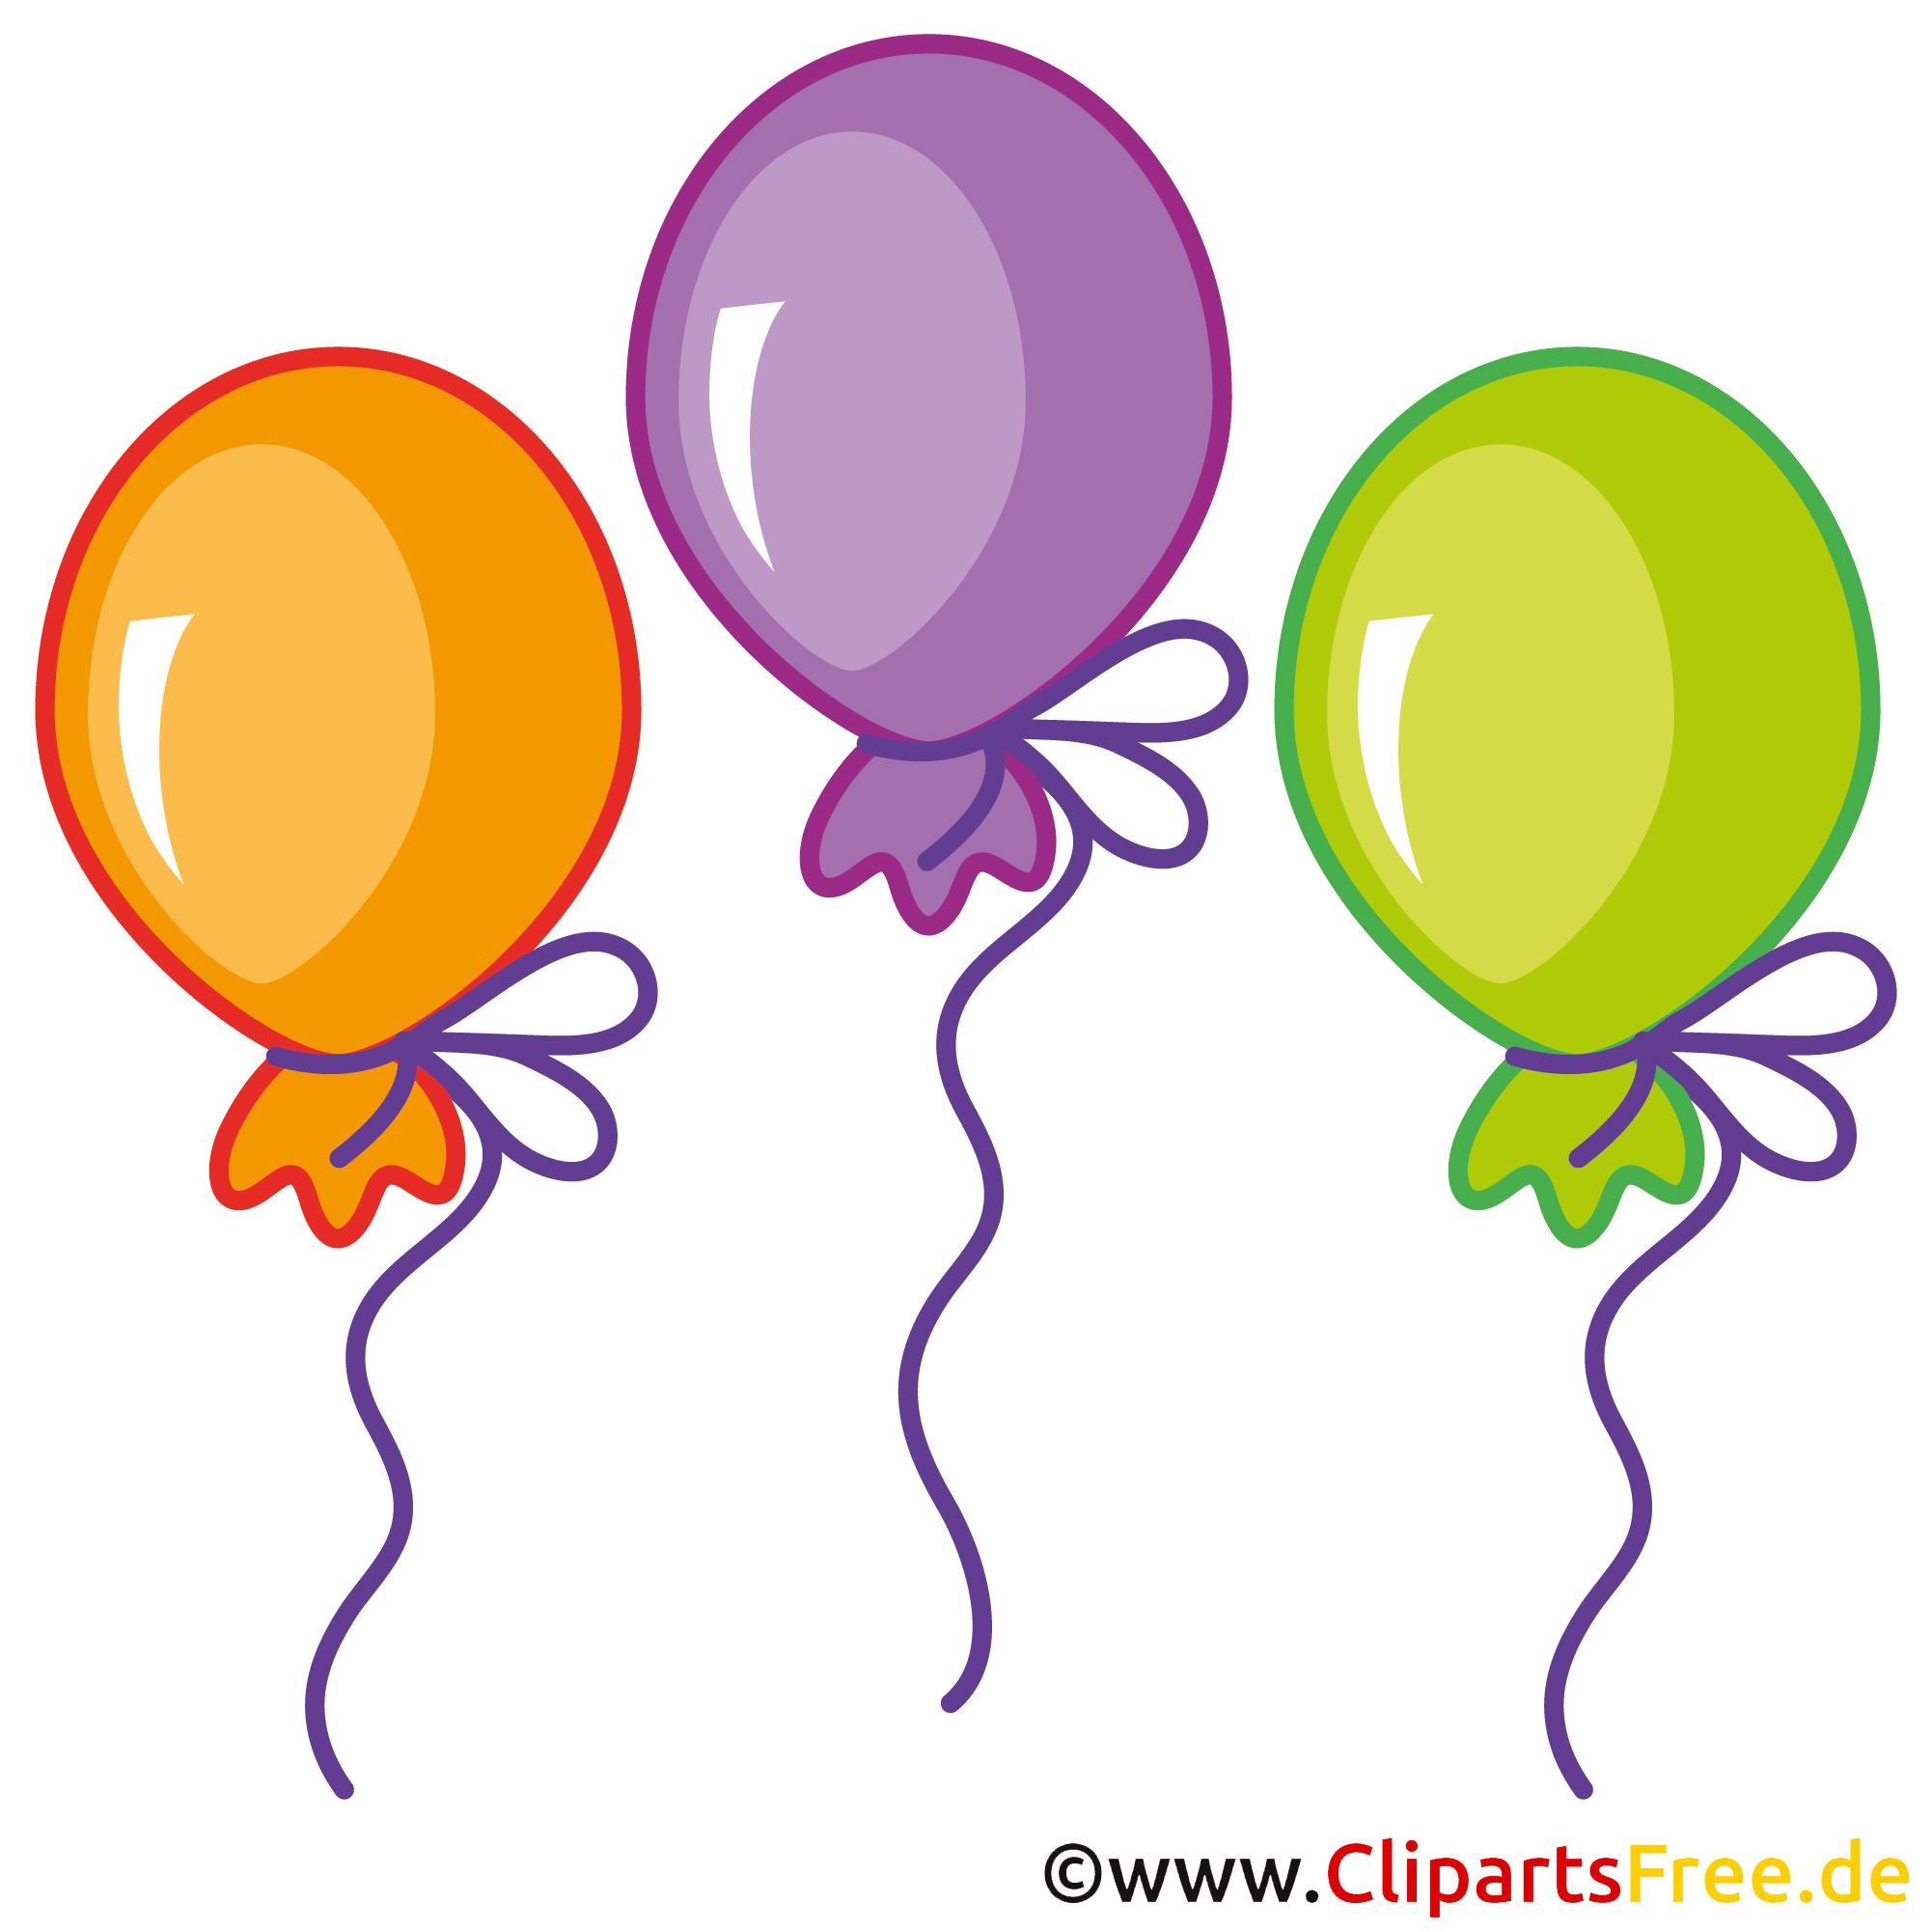 Luftballons Clipart Bild kostenlos